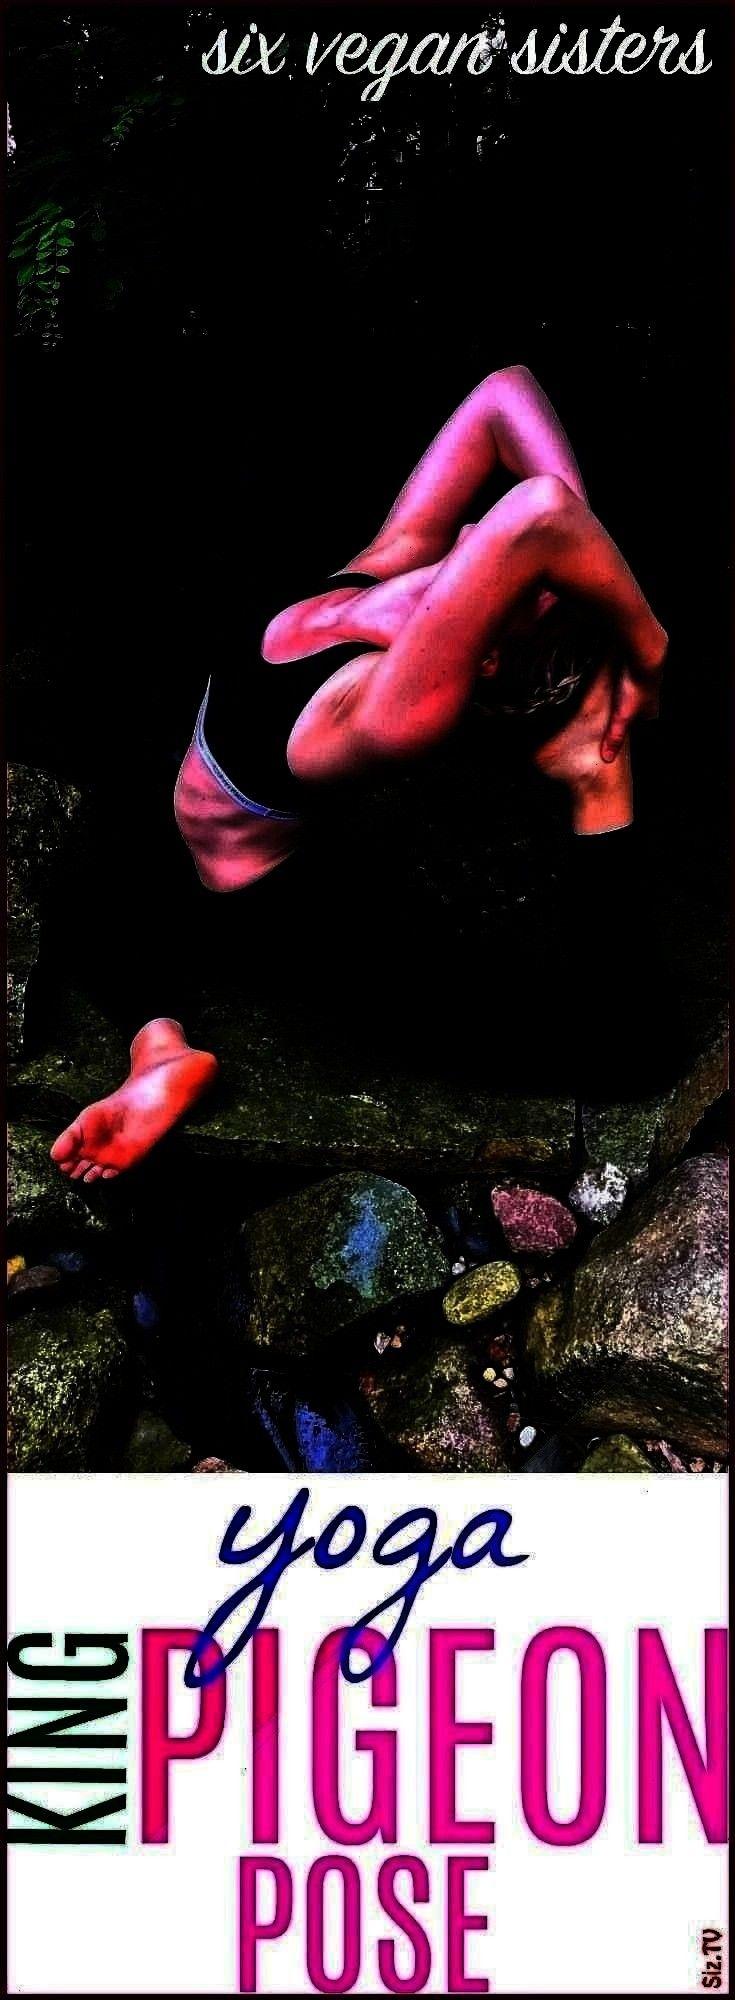 #photosaesthetic #kingkpigeon #photography #kingkpbody #aesthetic #classpose #posturas #kingkpae #nb...